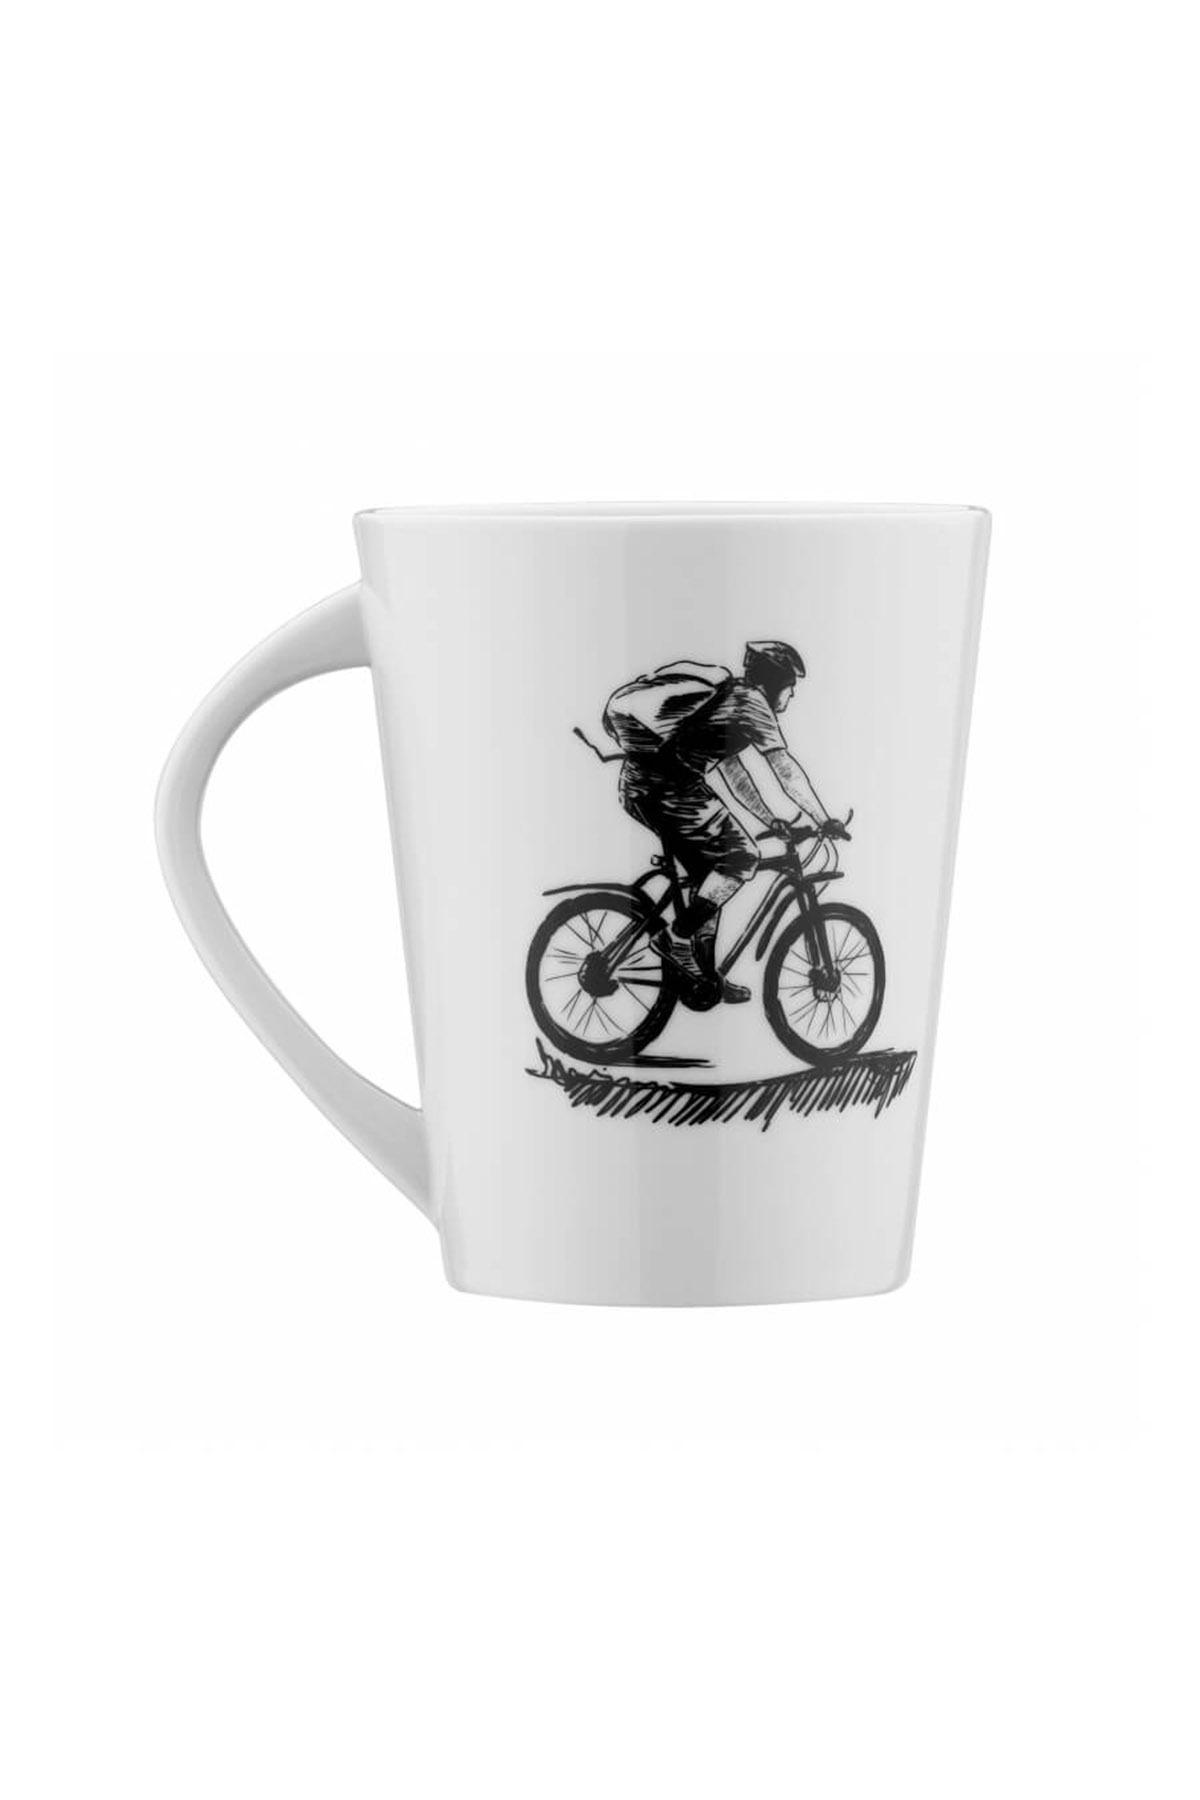 Kütahya Porselen Centilmen Serisi Mug Bardak Bisiklet